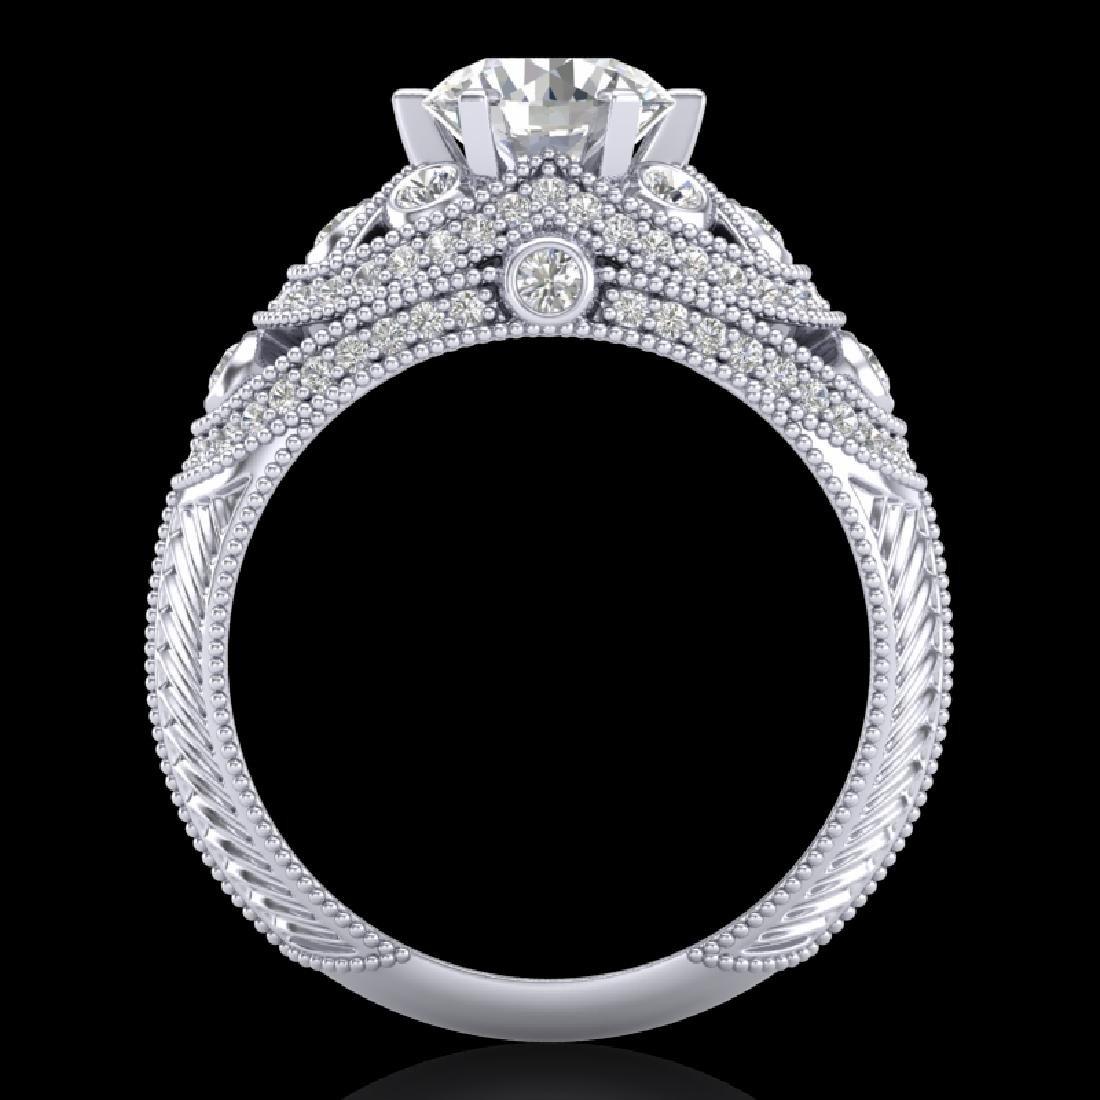 2 CTW VS/SI Diamond Solitaire Art Deco Ring 18K White